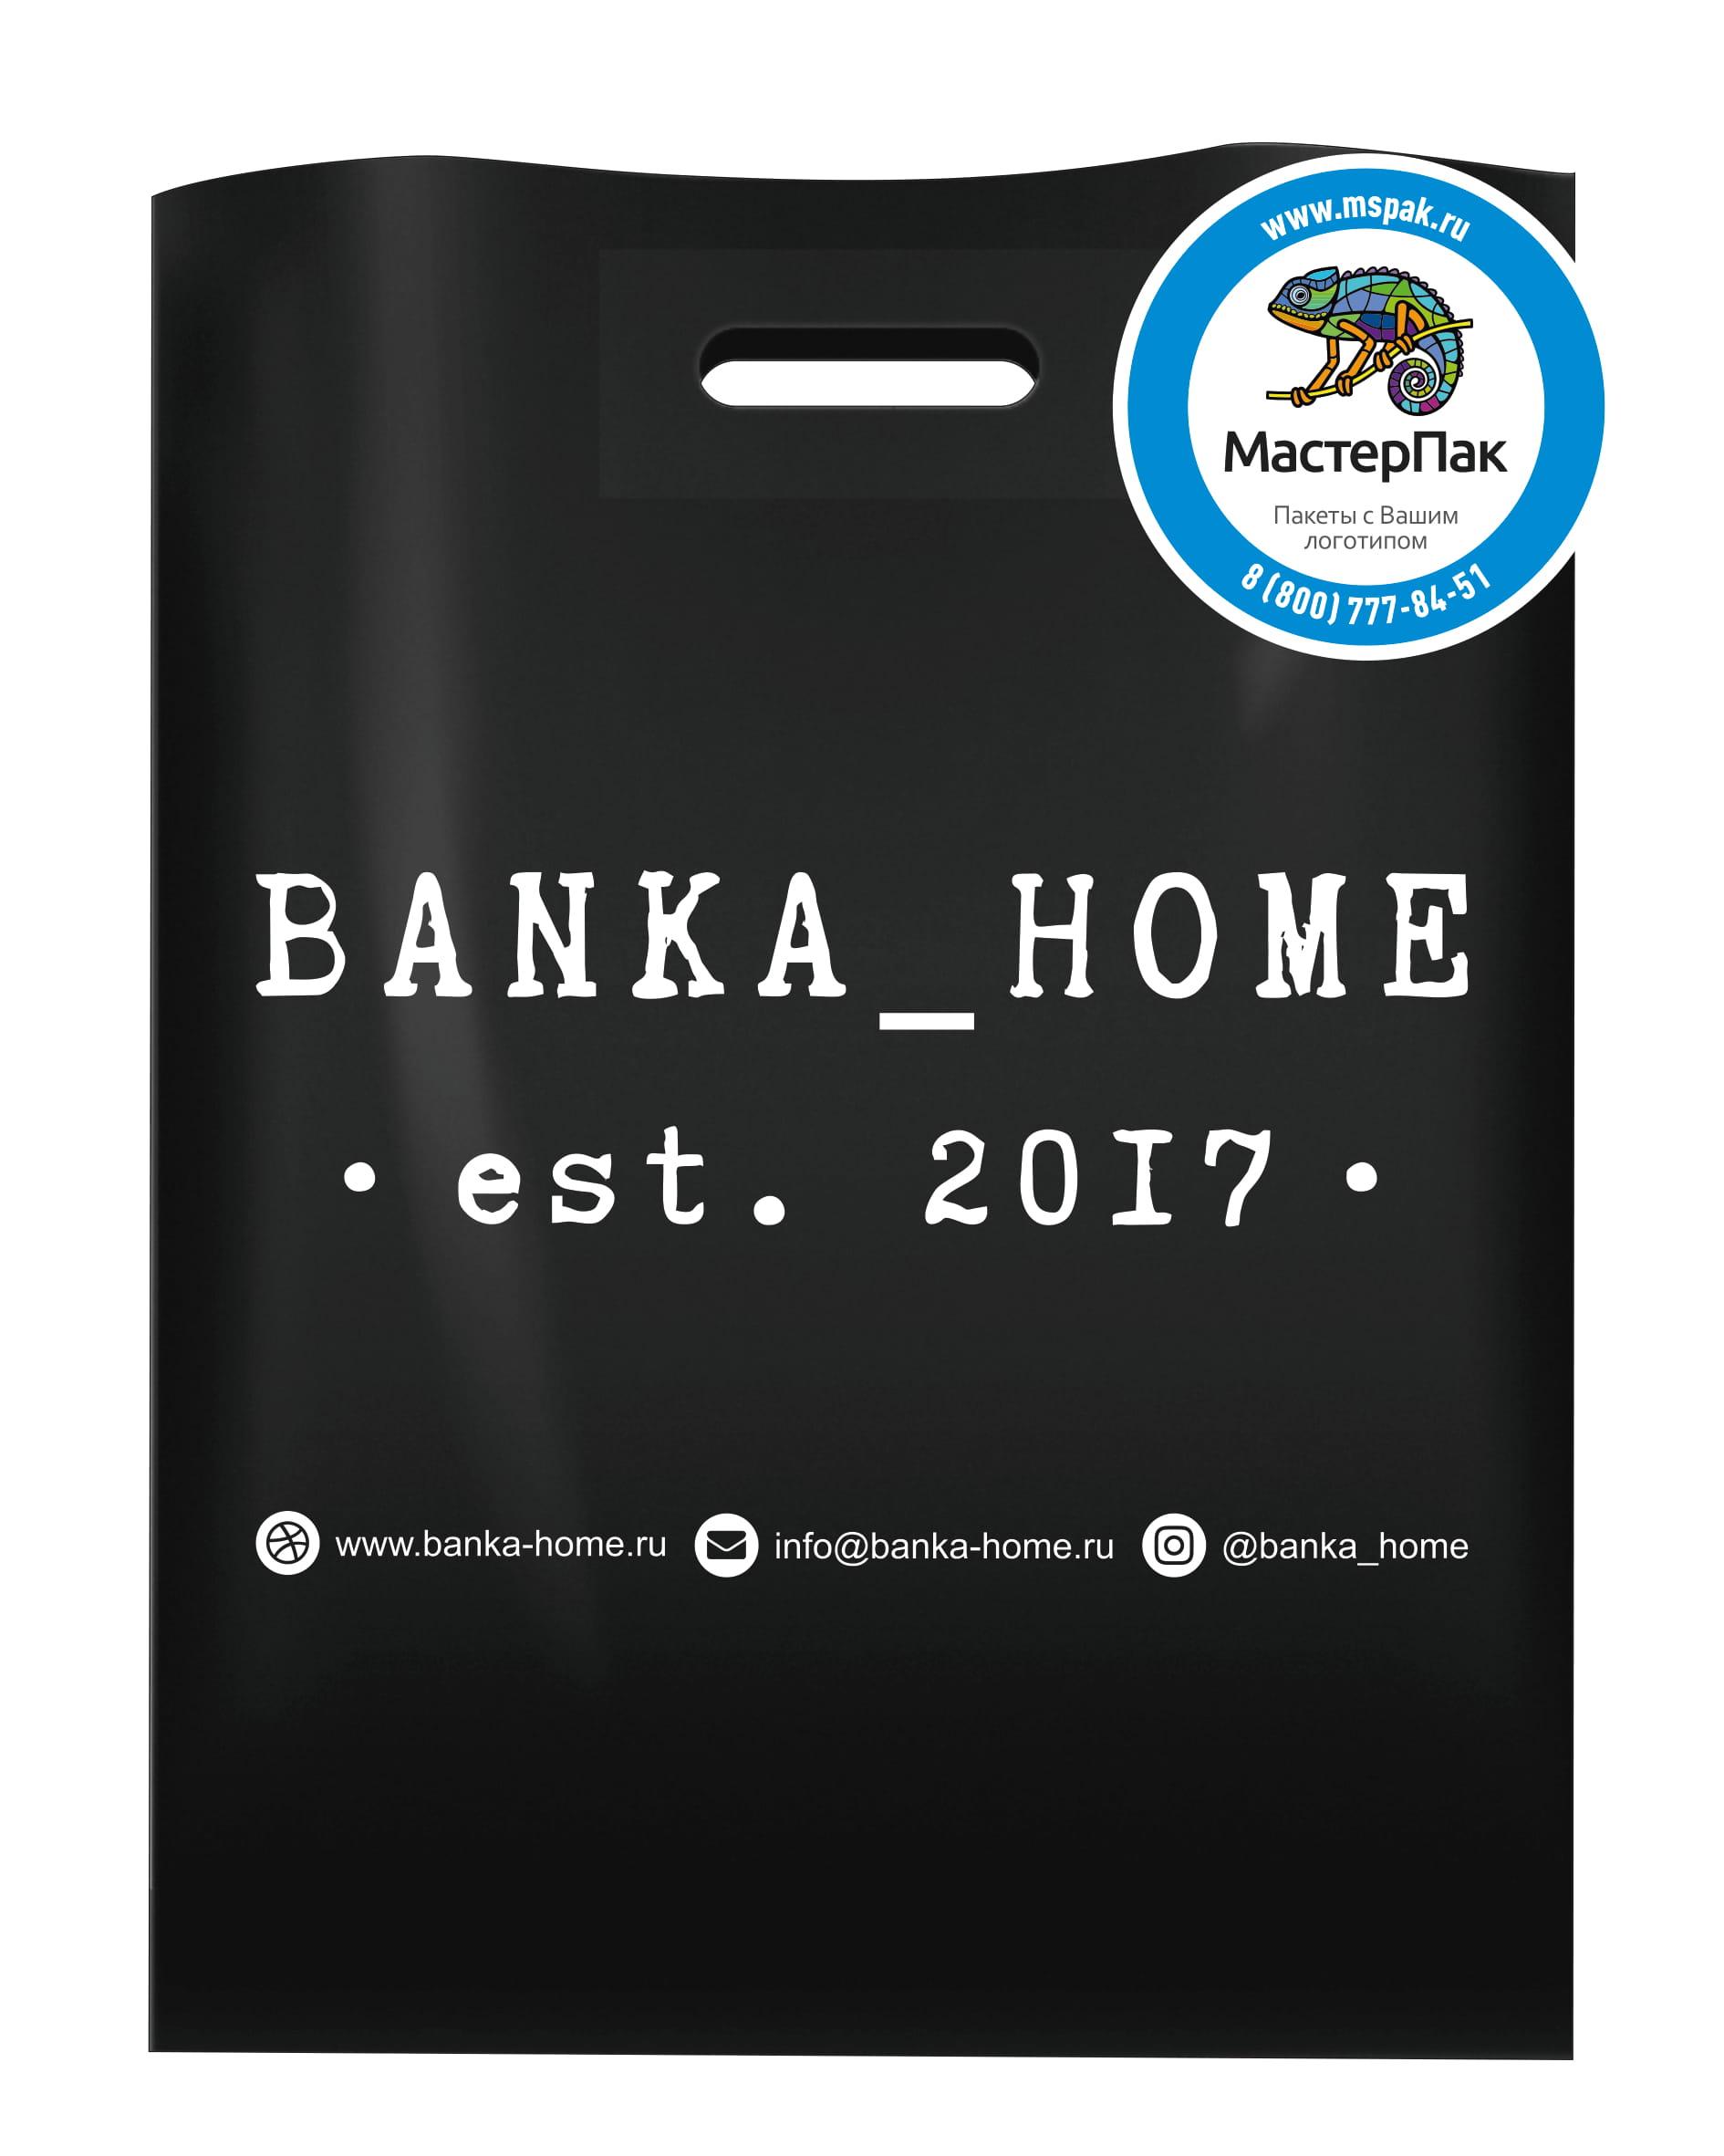 Пакет ПВД с логотипом Banka Home, Санкт-Петербург, 70 мкм, 30*40